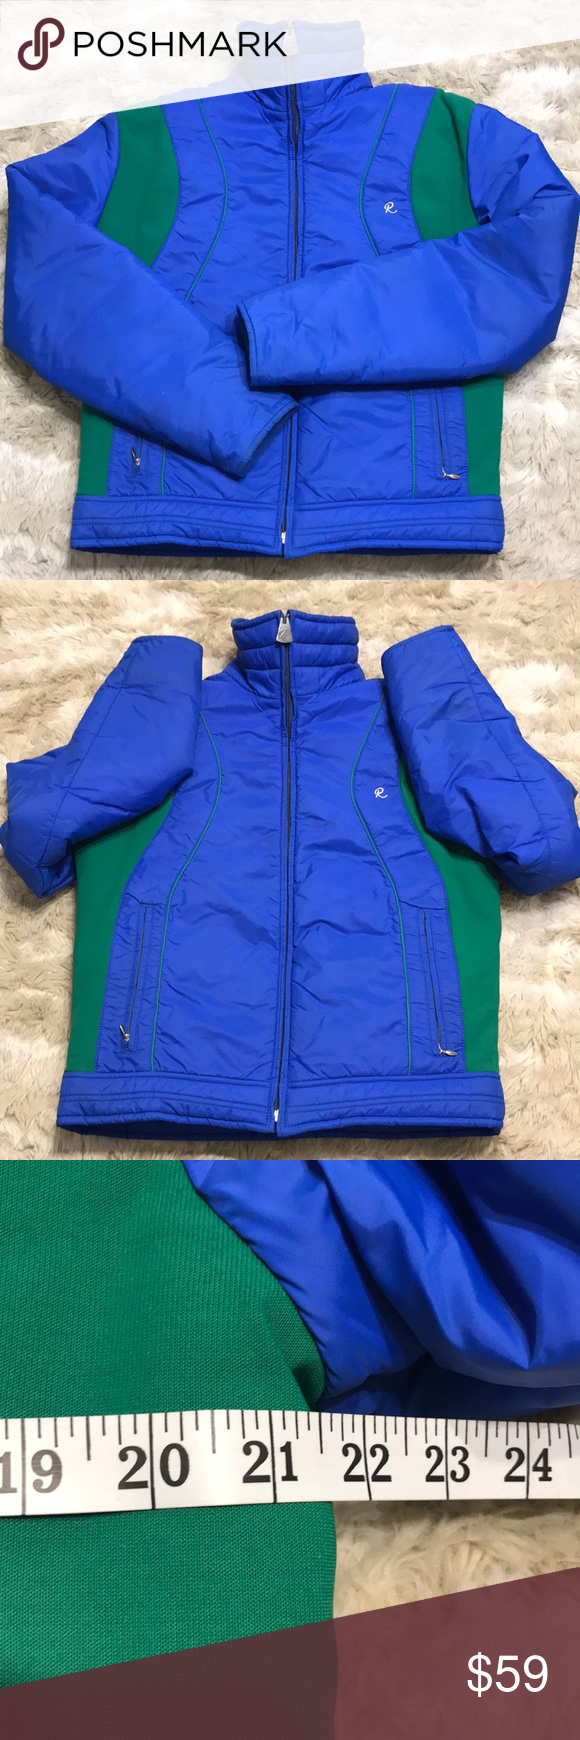 Vtg Roffe Down Ski Puffer Jacket Vintage Ski Jacket Vintage Jacket Bear Outfits [ 1740 x 580 Pixel ]